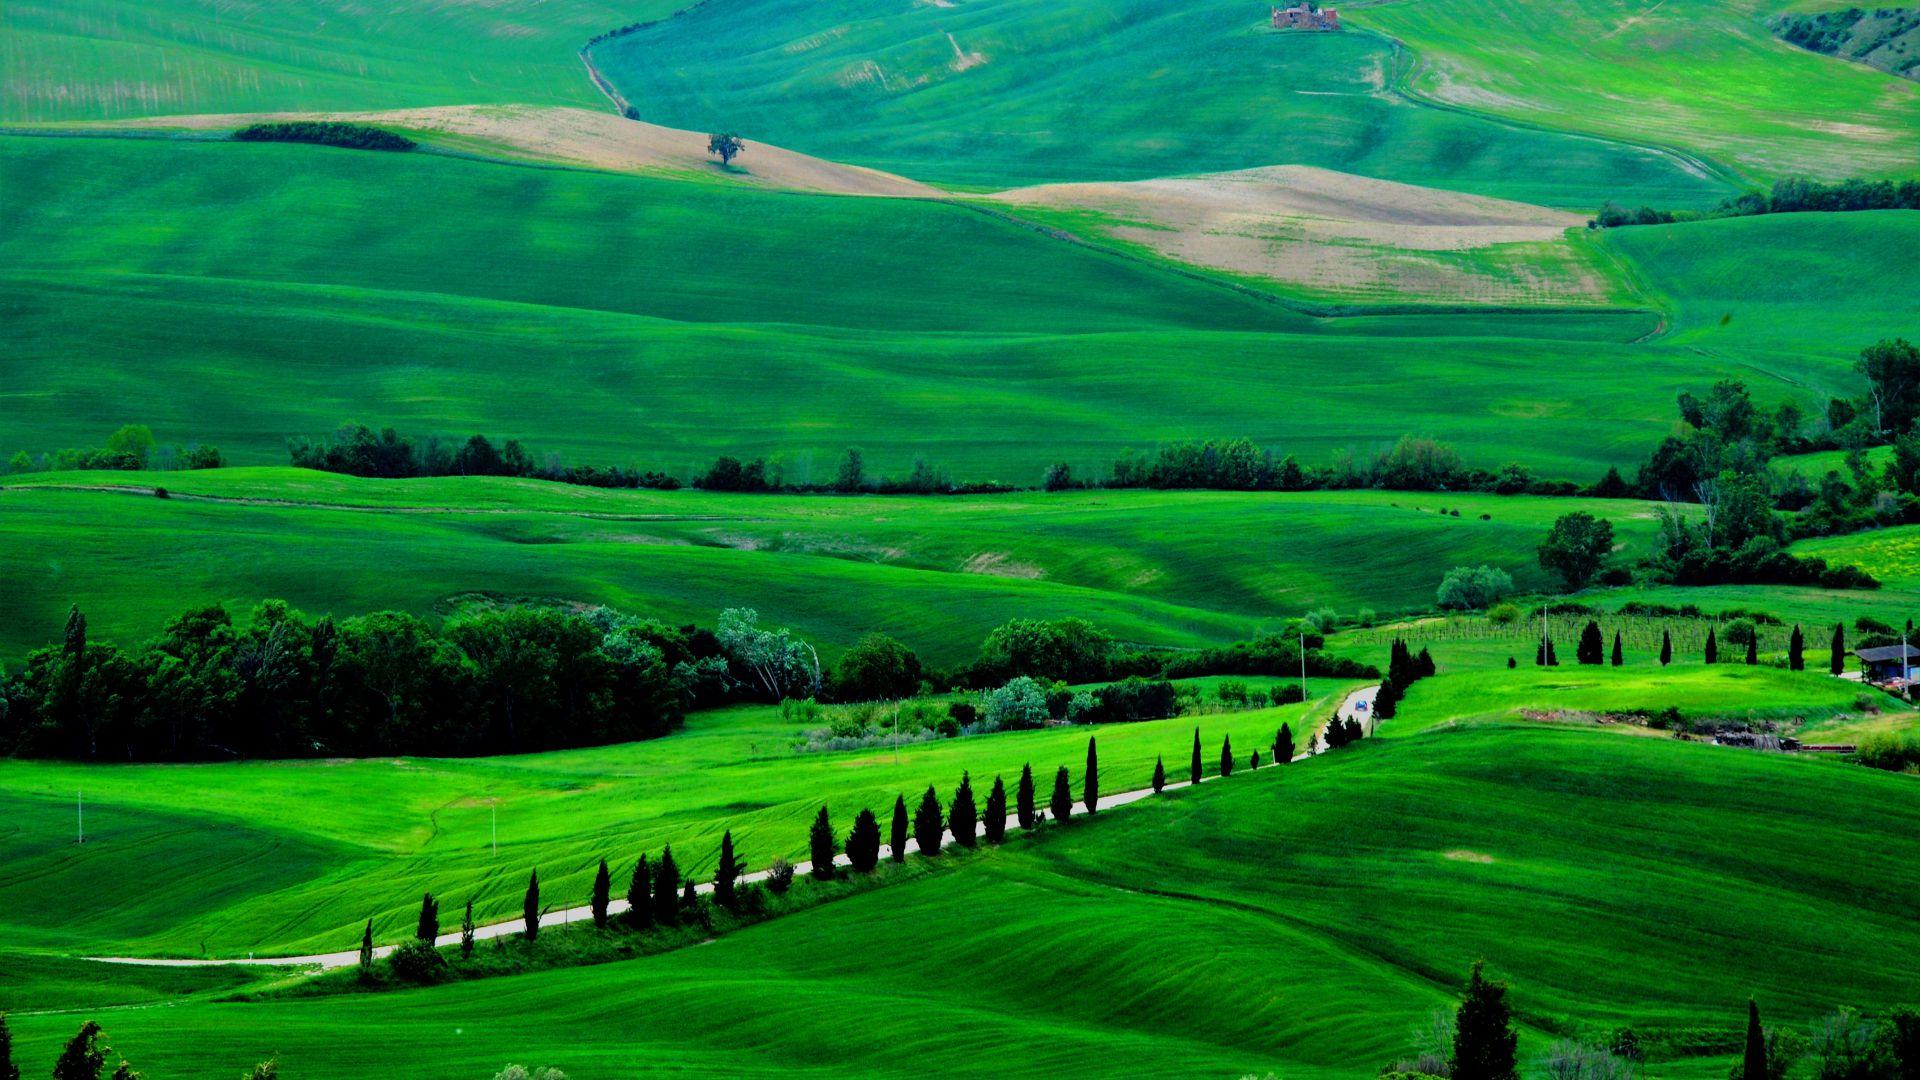 wallpaper tuscany, 4k, hd wallpaper, italy, meadows, hills, pines